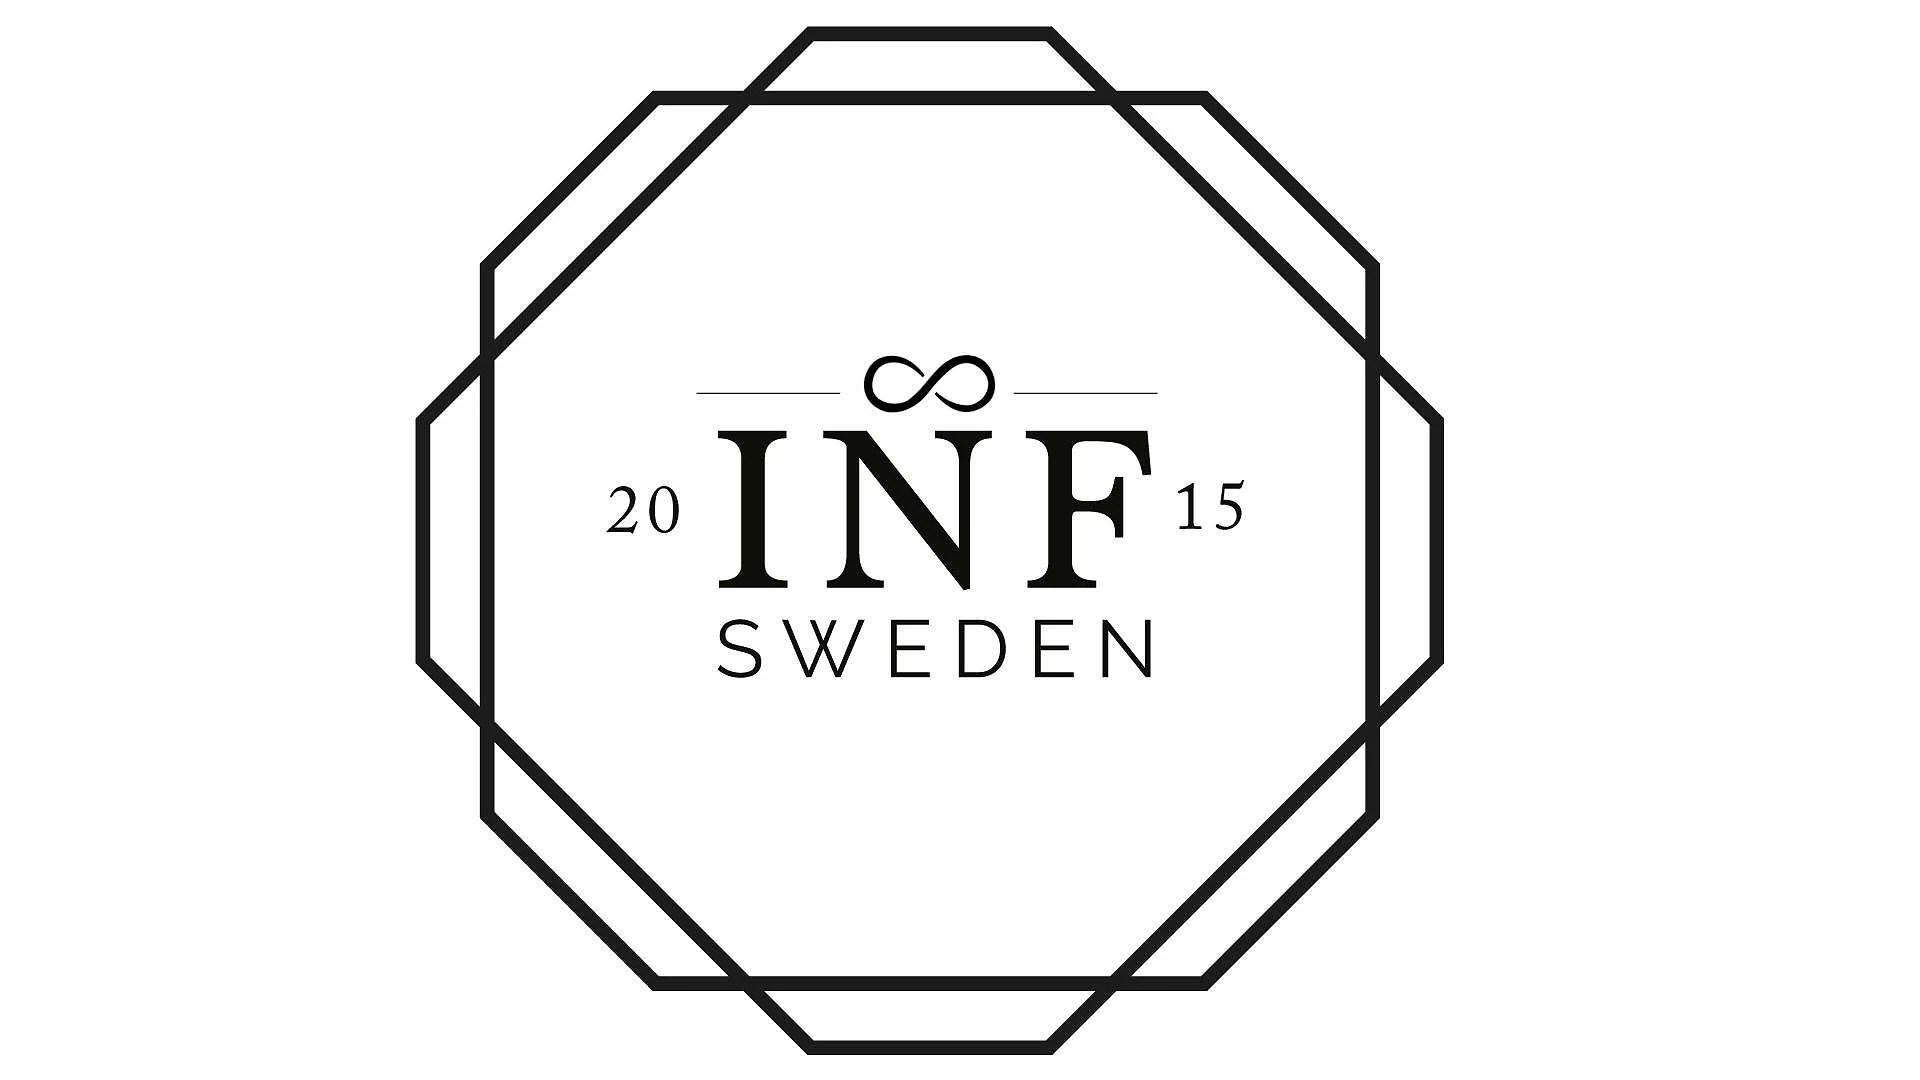 Infinitio öppnar ett dotterbolag - INF SWEDEN